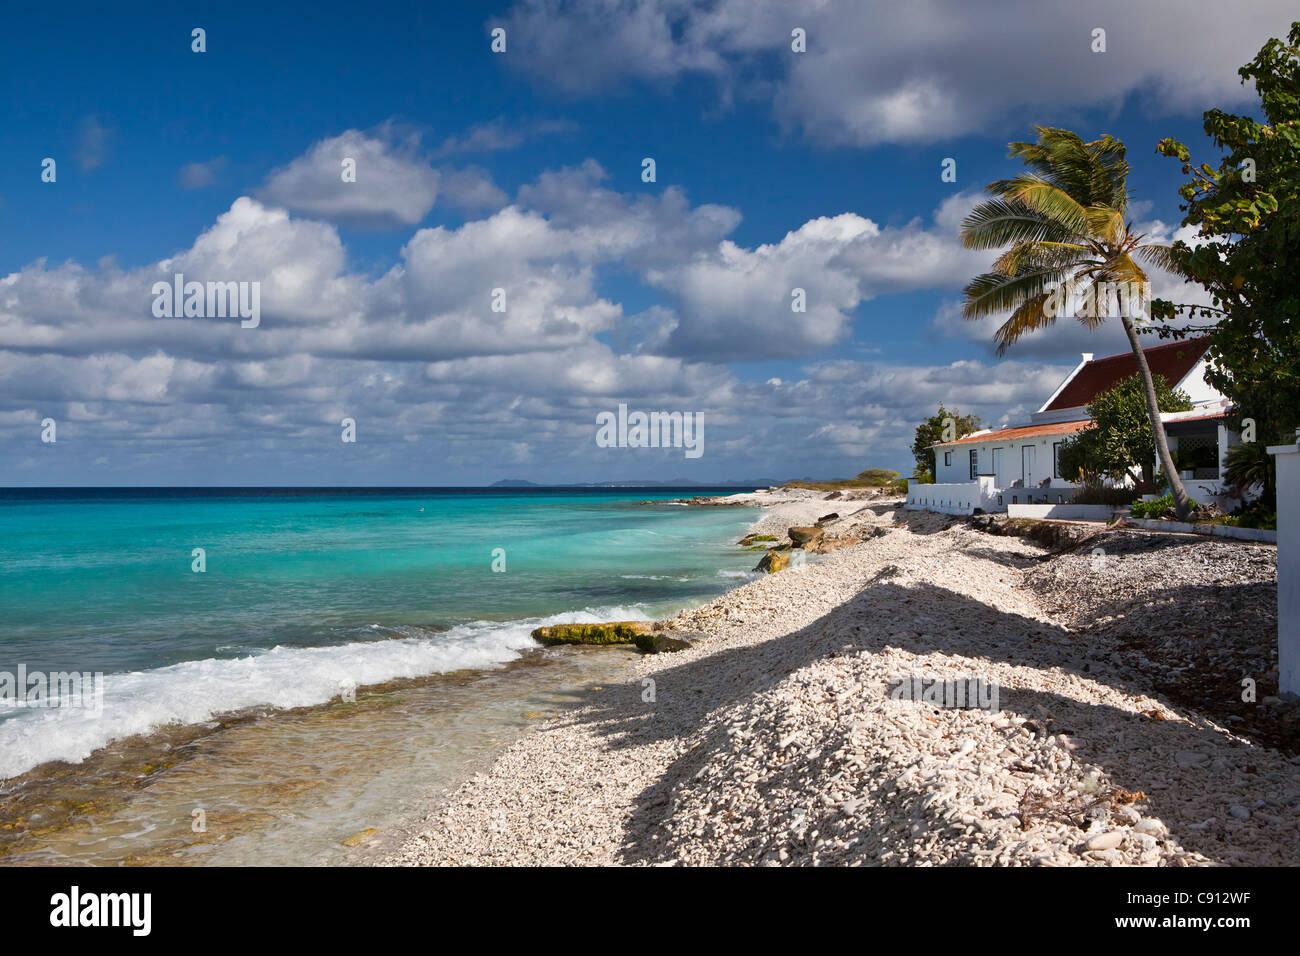 The Netherlands, Bonaire Island, Dutch Caribbean, Kralendijk, house on beach. - Stock Image